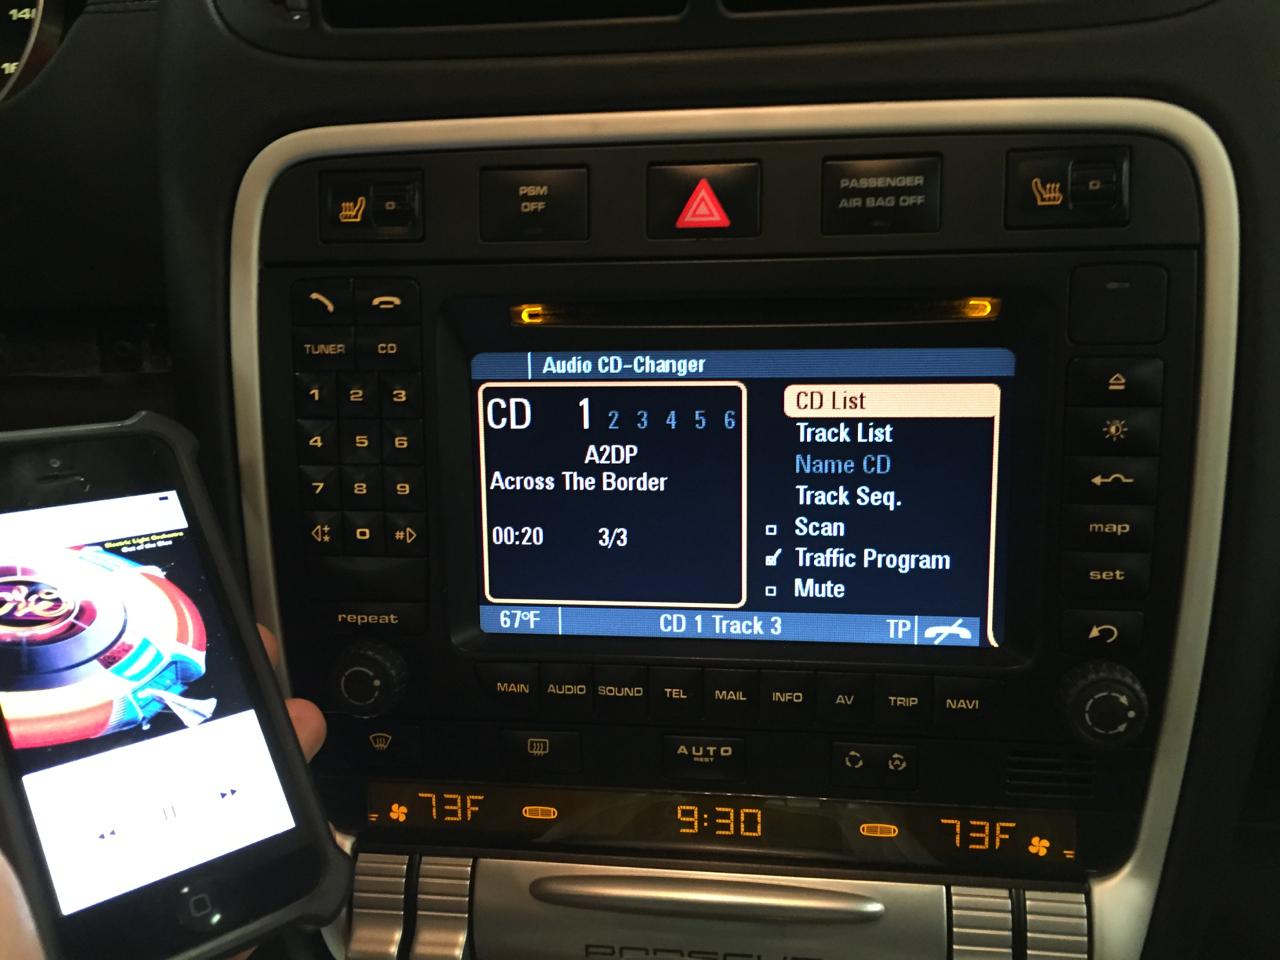 Porsche Cayenne - Remote Car Starter and Bluetooth - Car